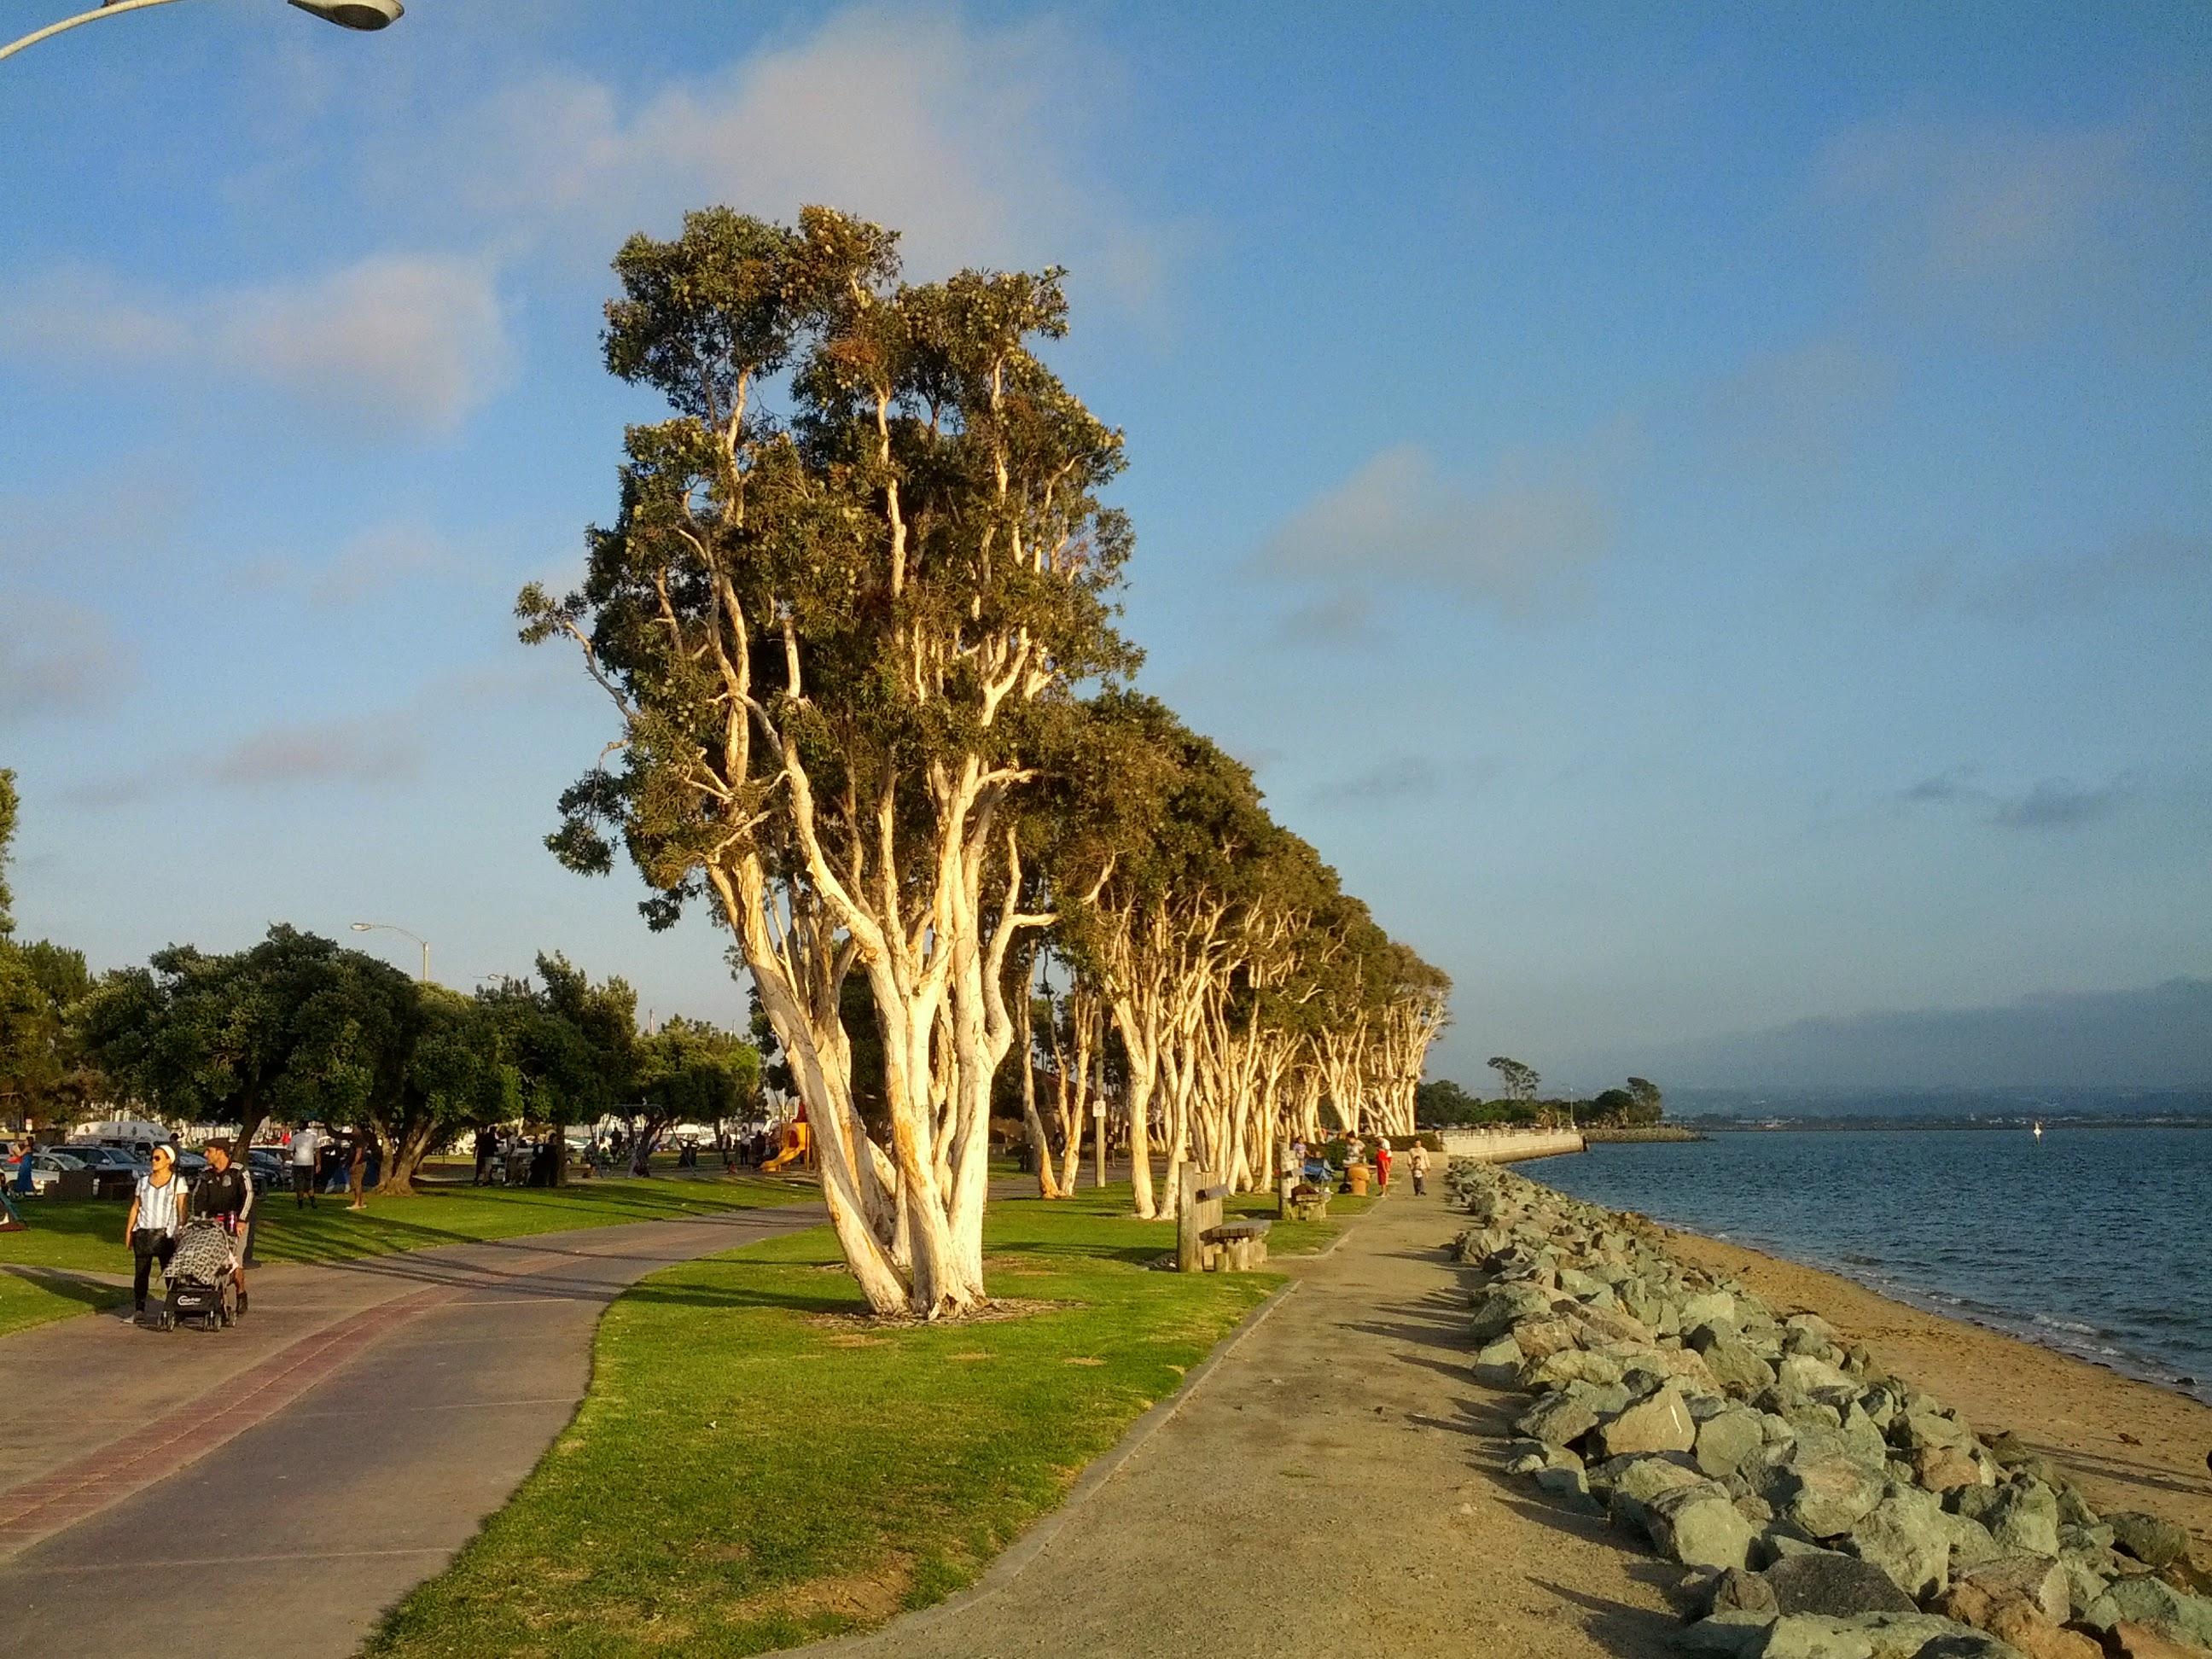 FileTrees in Chula Vista Bayfront Parkjpg Wikimedia Commons